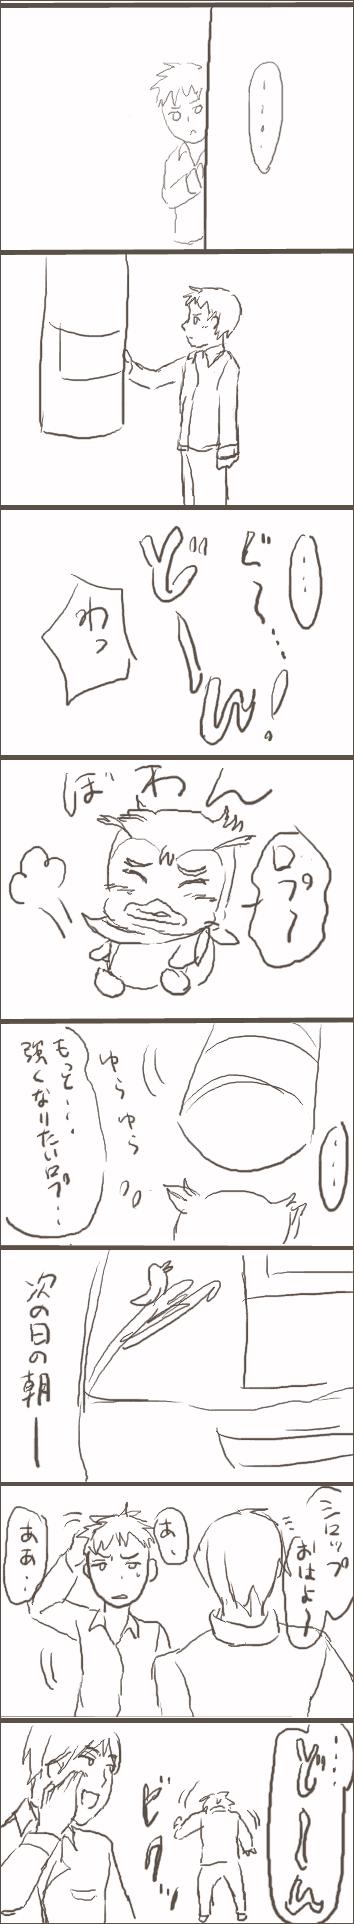 manga20.png